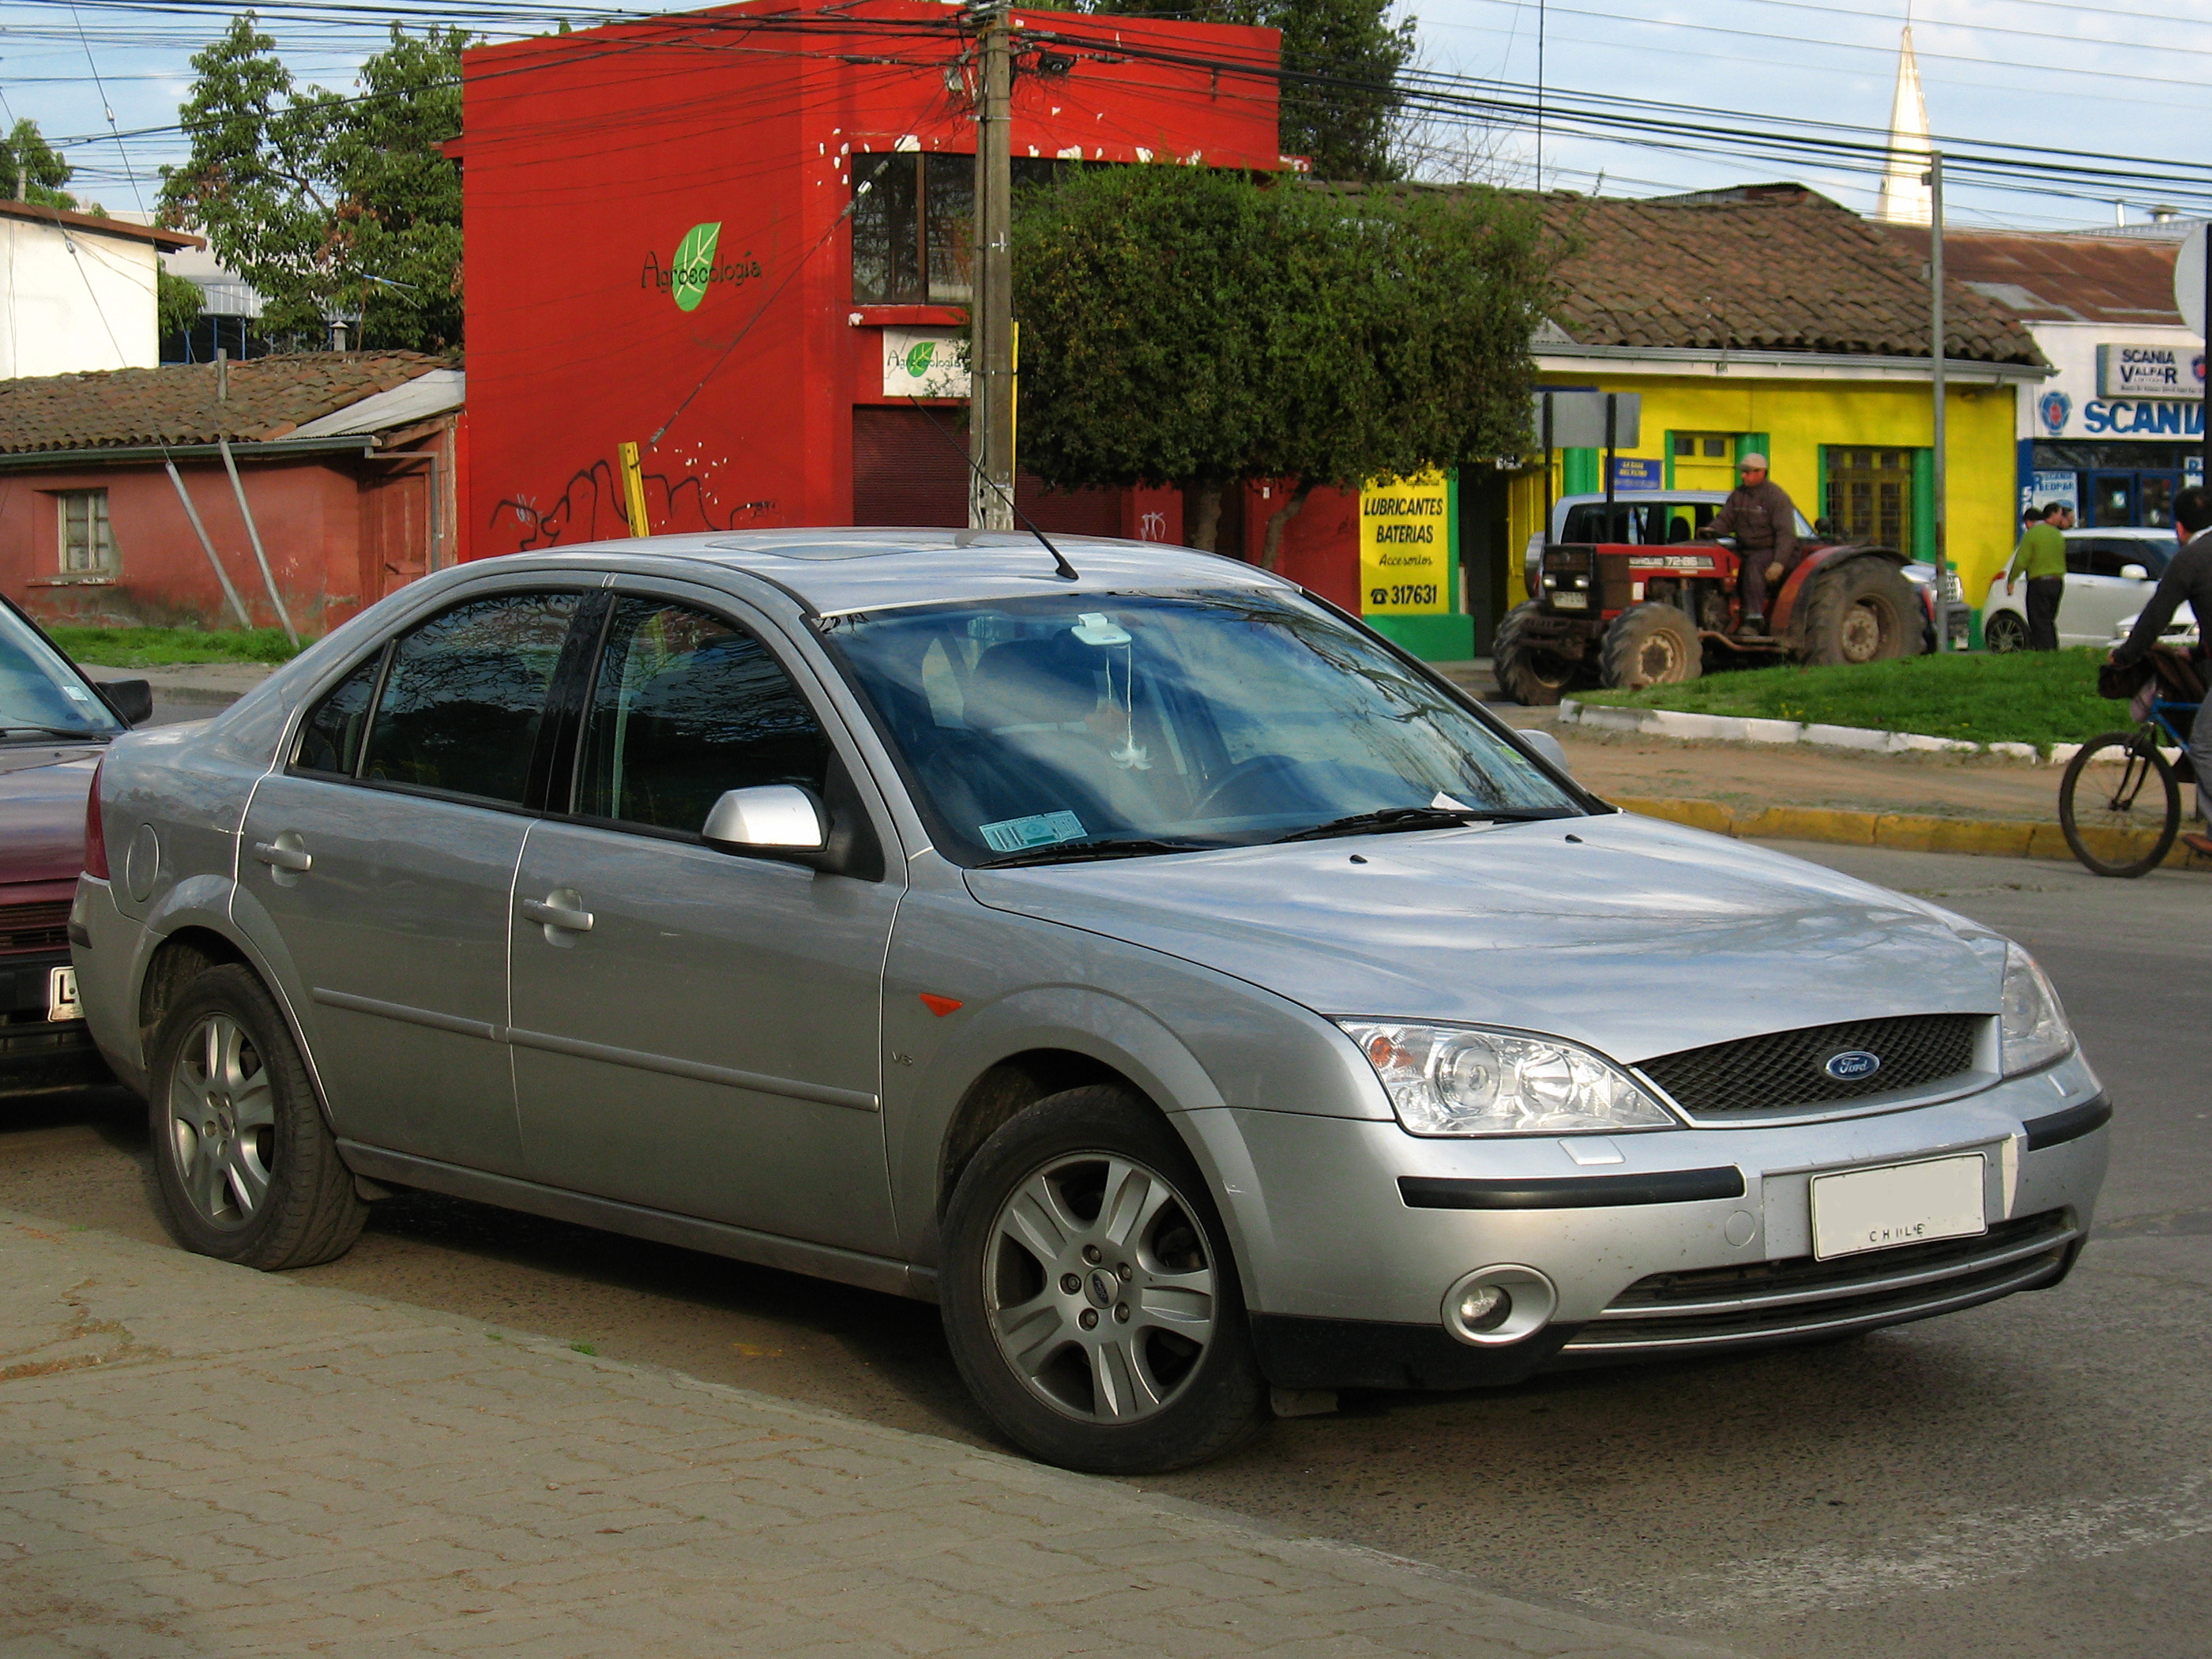 File:Ford Mondeo V6 Ghia 2005 (19917825622).jpg